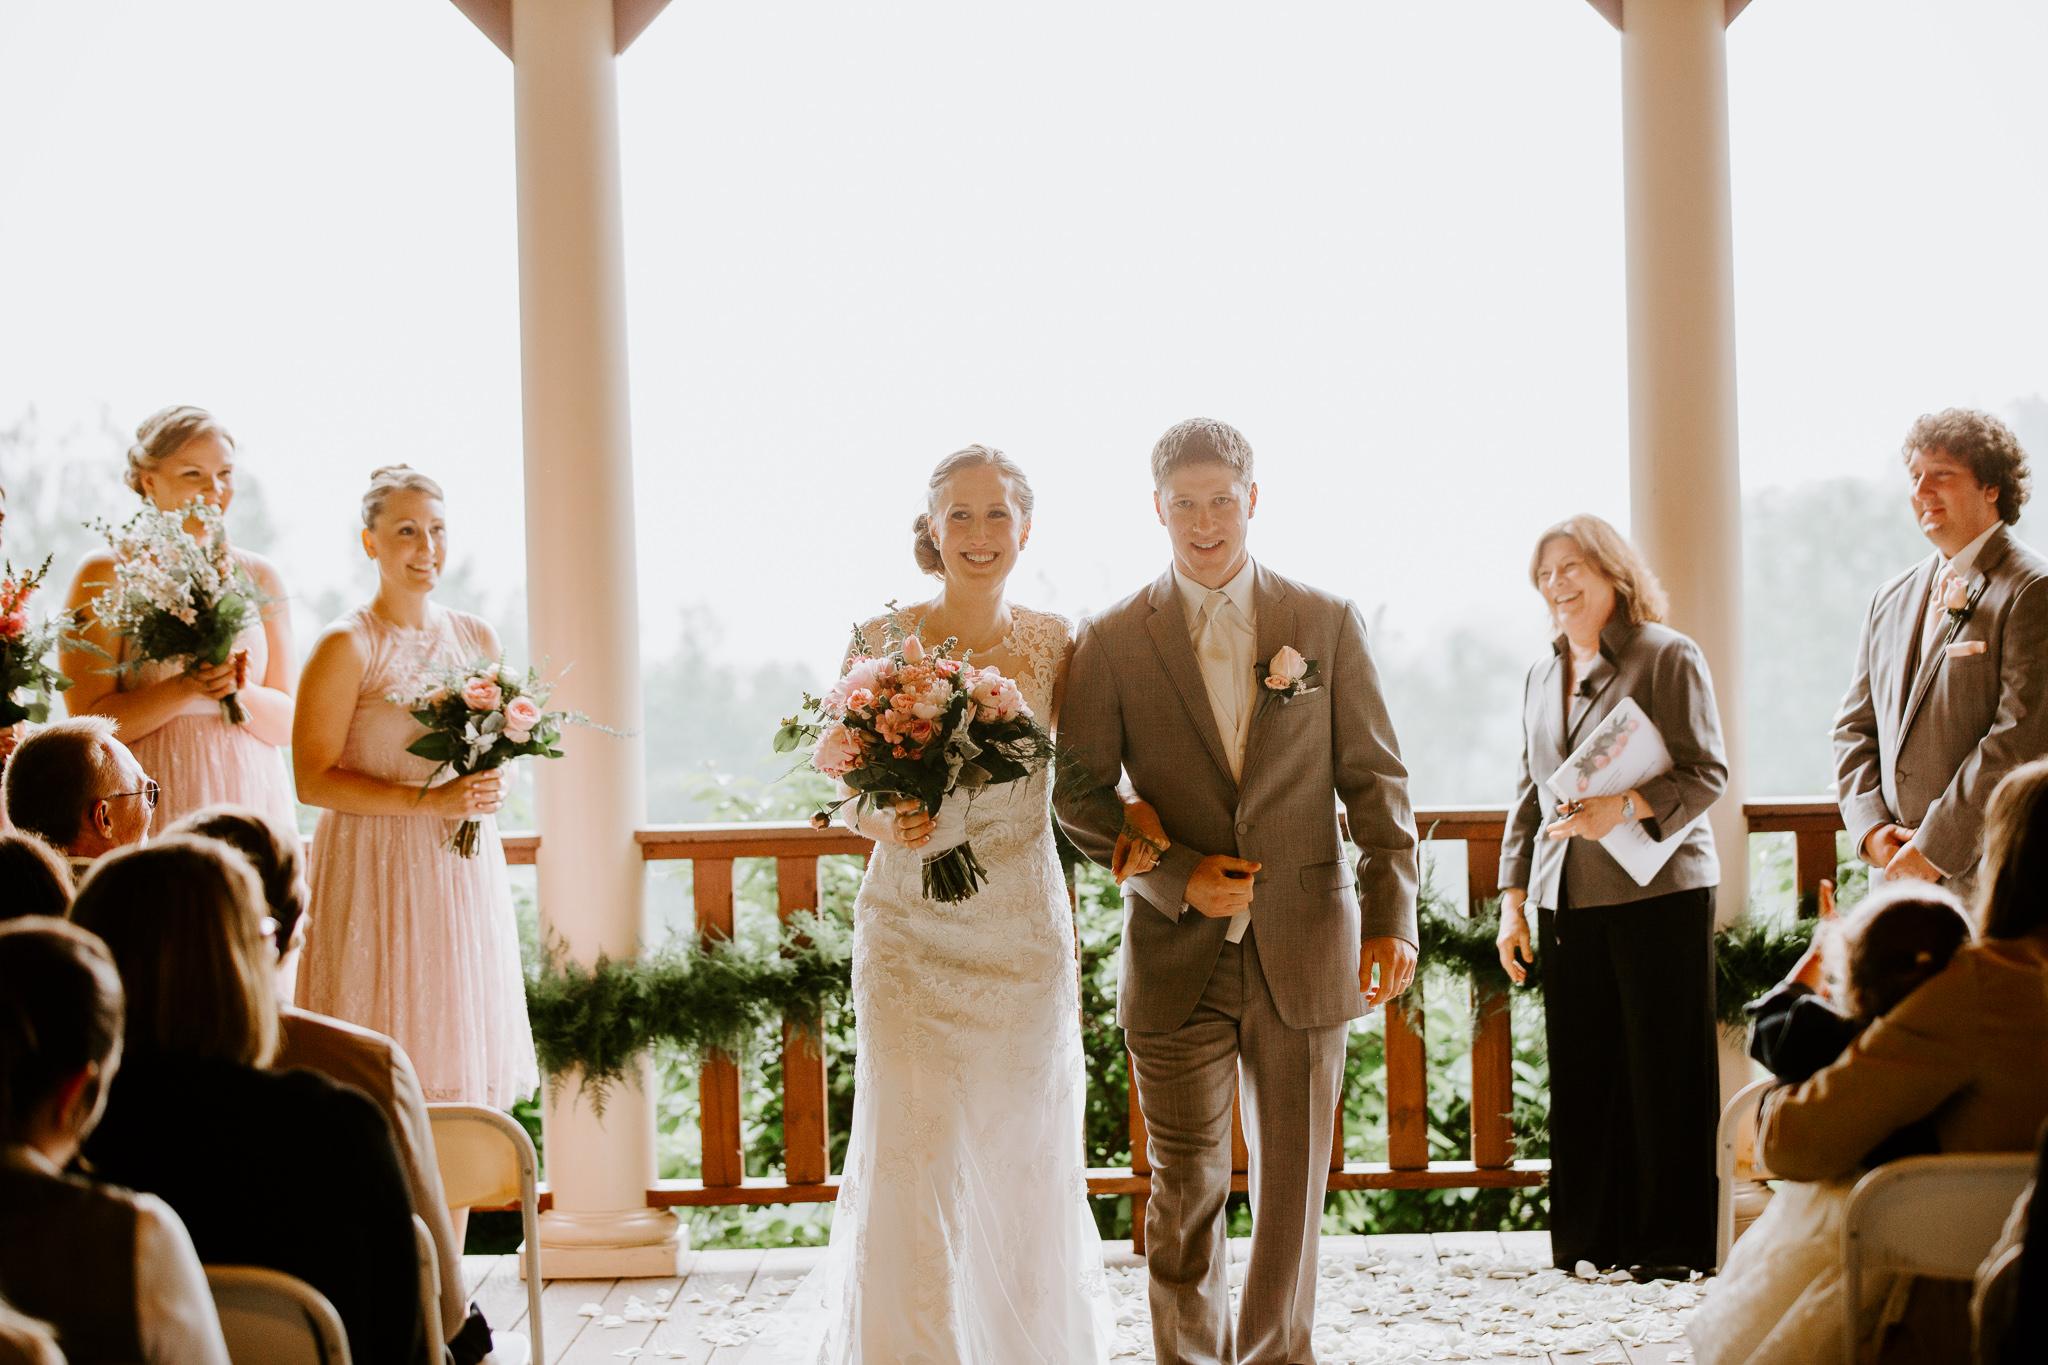 House Mountain Inn - Weddings - Lexington - Virginia - Best Wedding Photographer - Pat Cori Photography-61.jpg